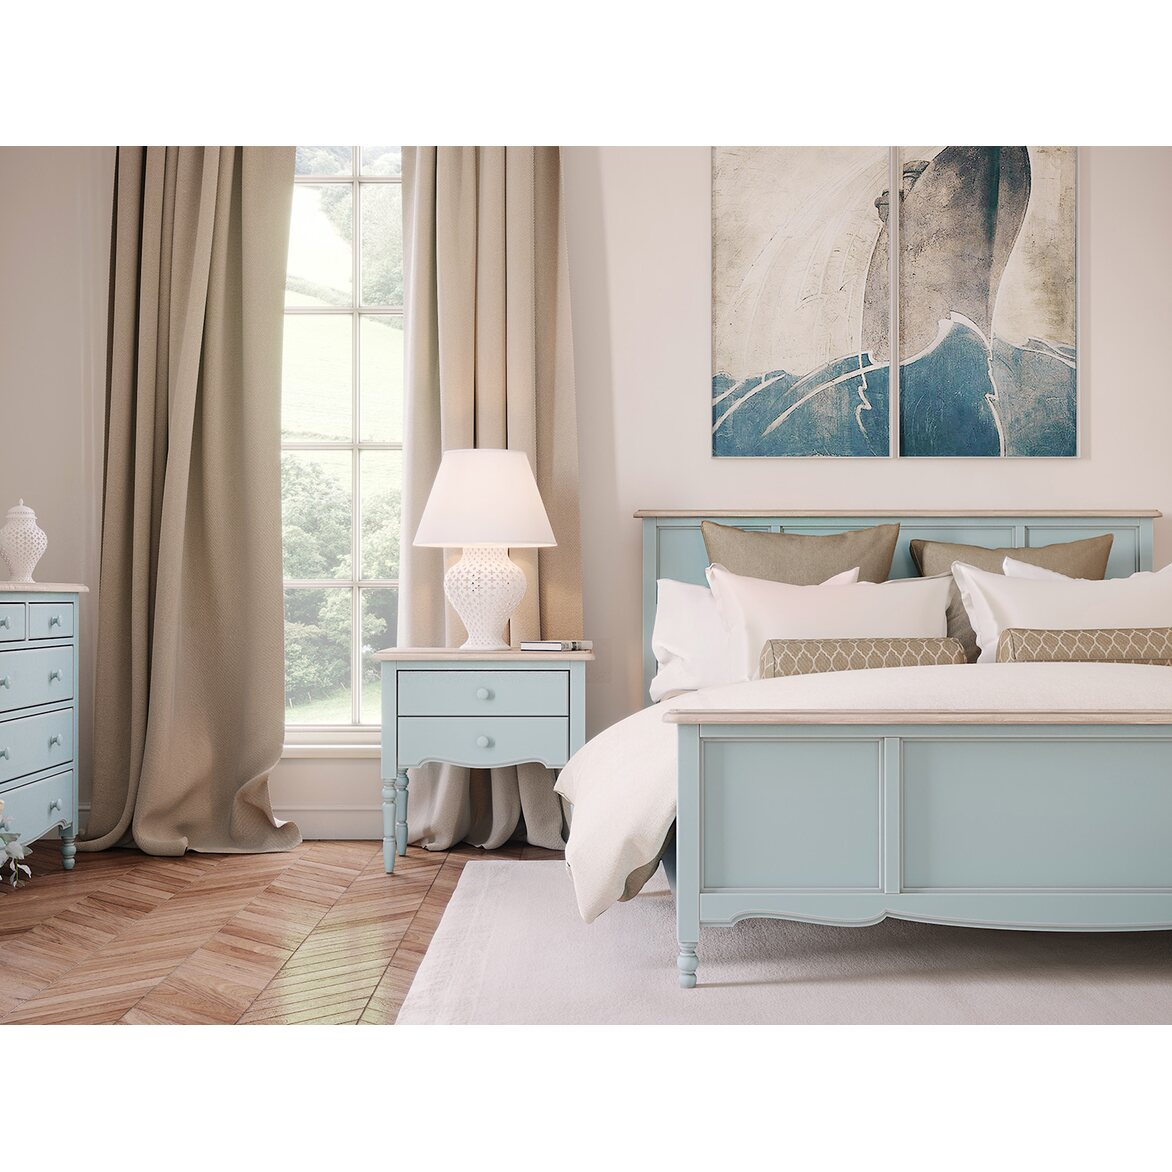 Зеркало прямоугольное Leblanc, голубое 4 | Настенные зеркала Kingsby